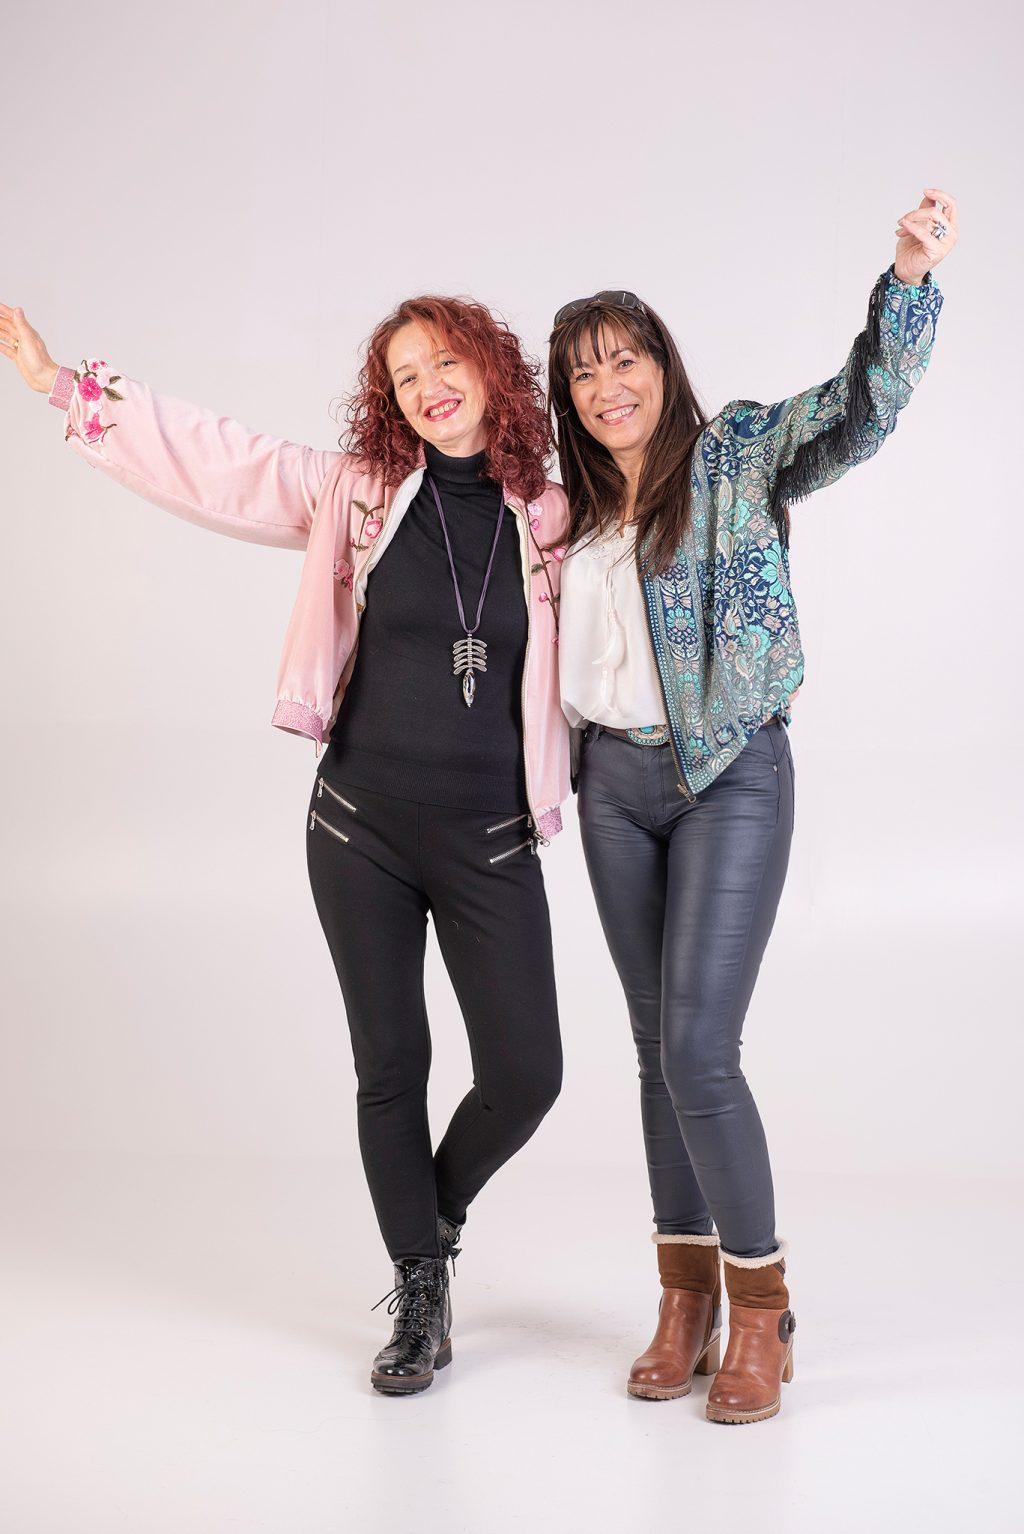 About us - Kyoka Clothing